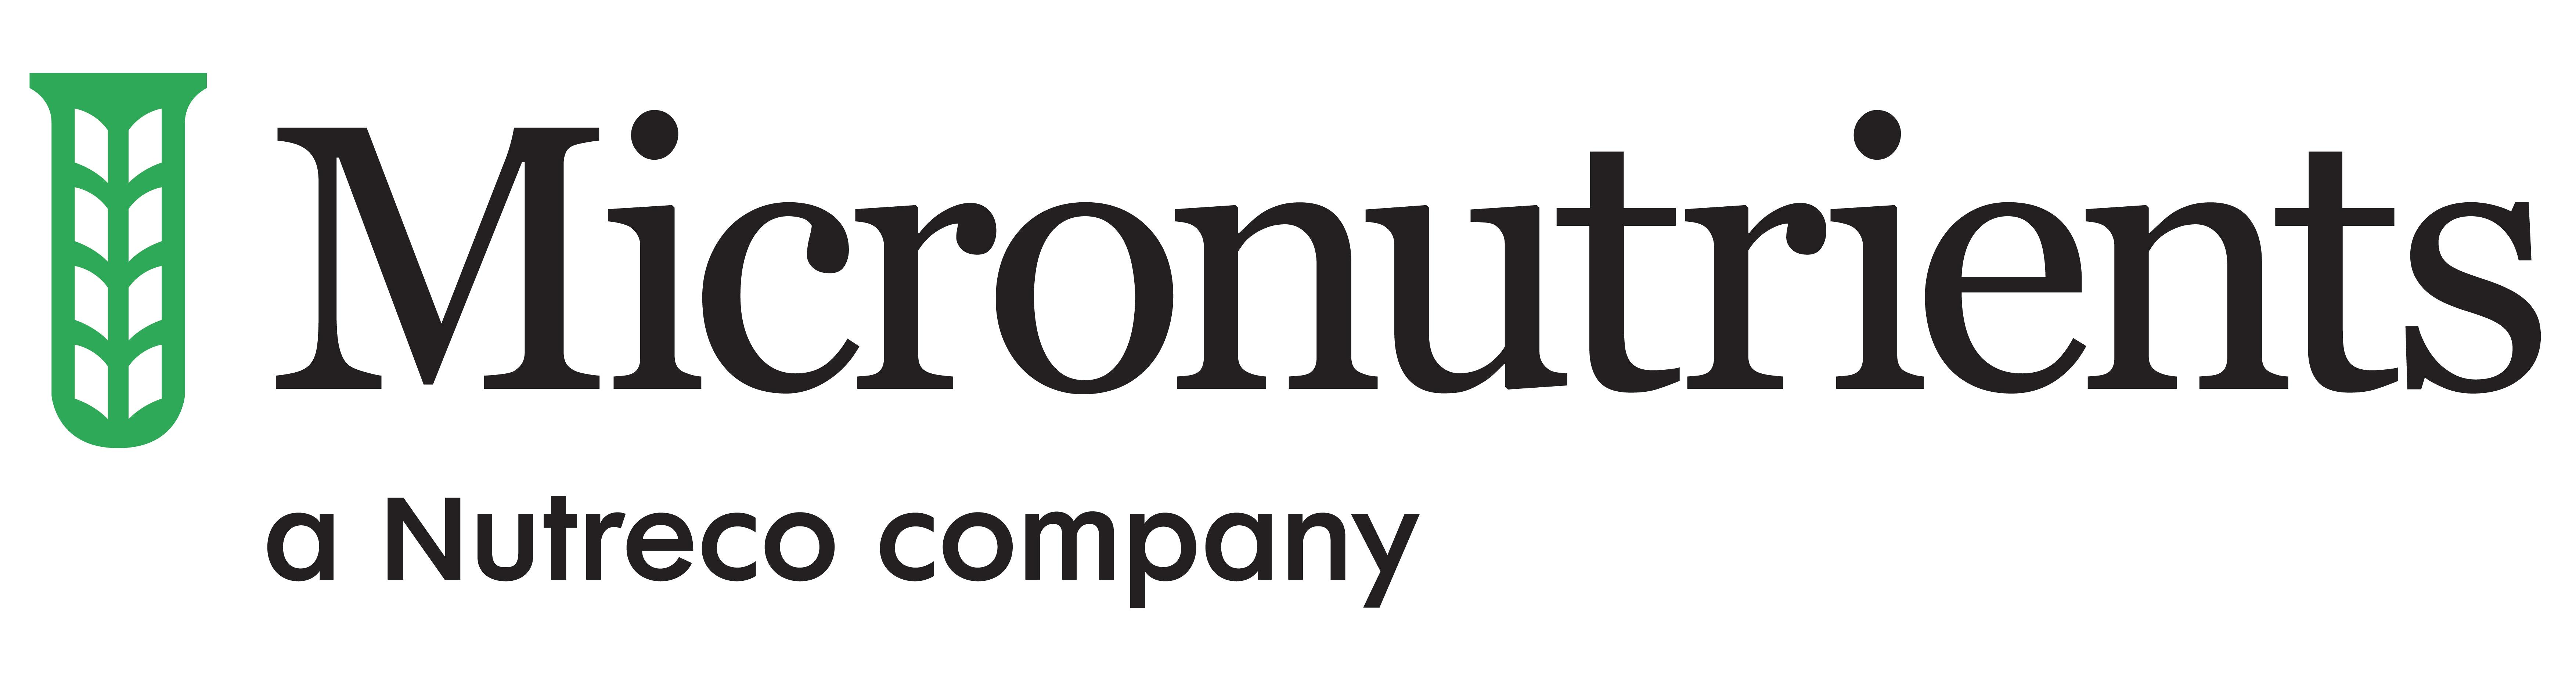 Micronutrients Logo-Color-01